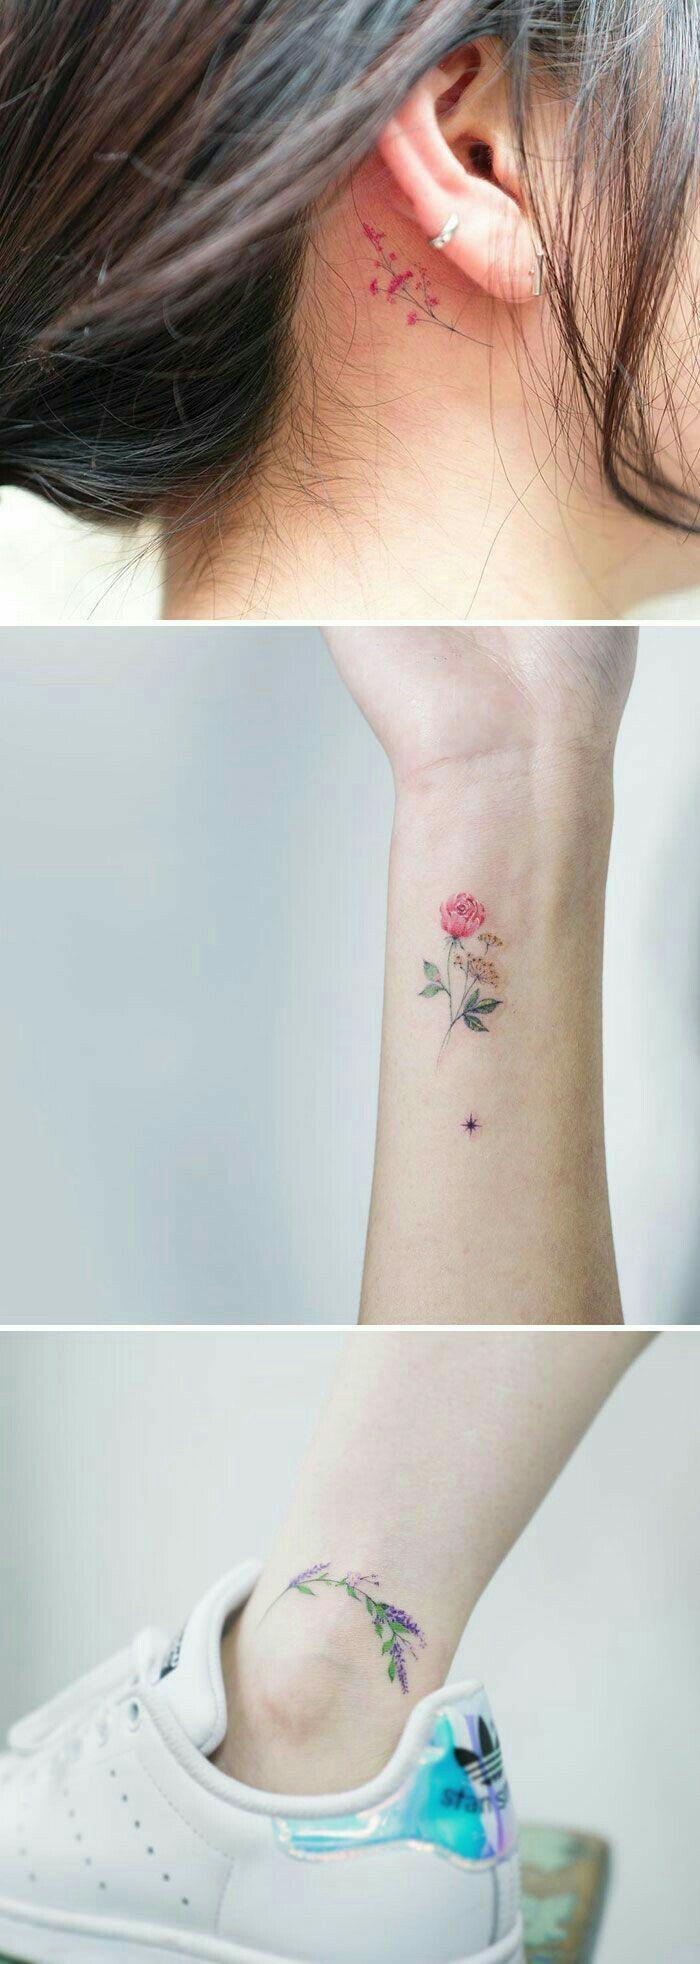 The ankle tattoo placement.  SHOP: www.seayogi.es  IG: @Seayogipalma   Ropa para Yoga  ---  Yoga apparel & Gear